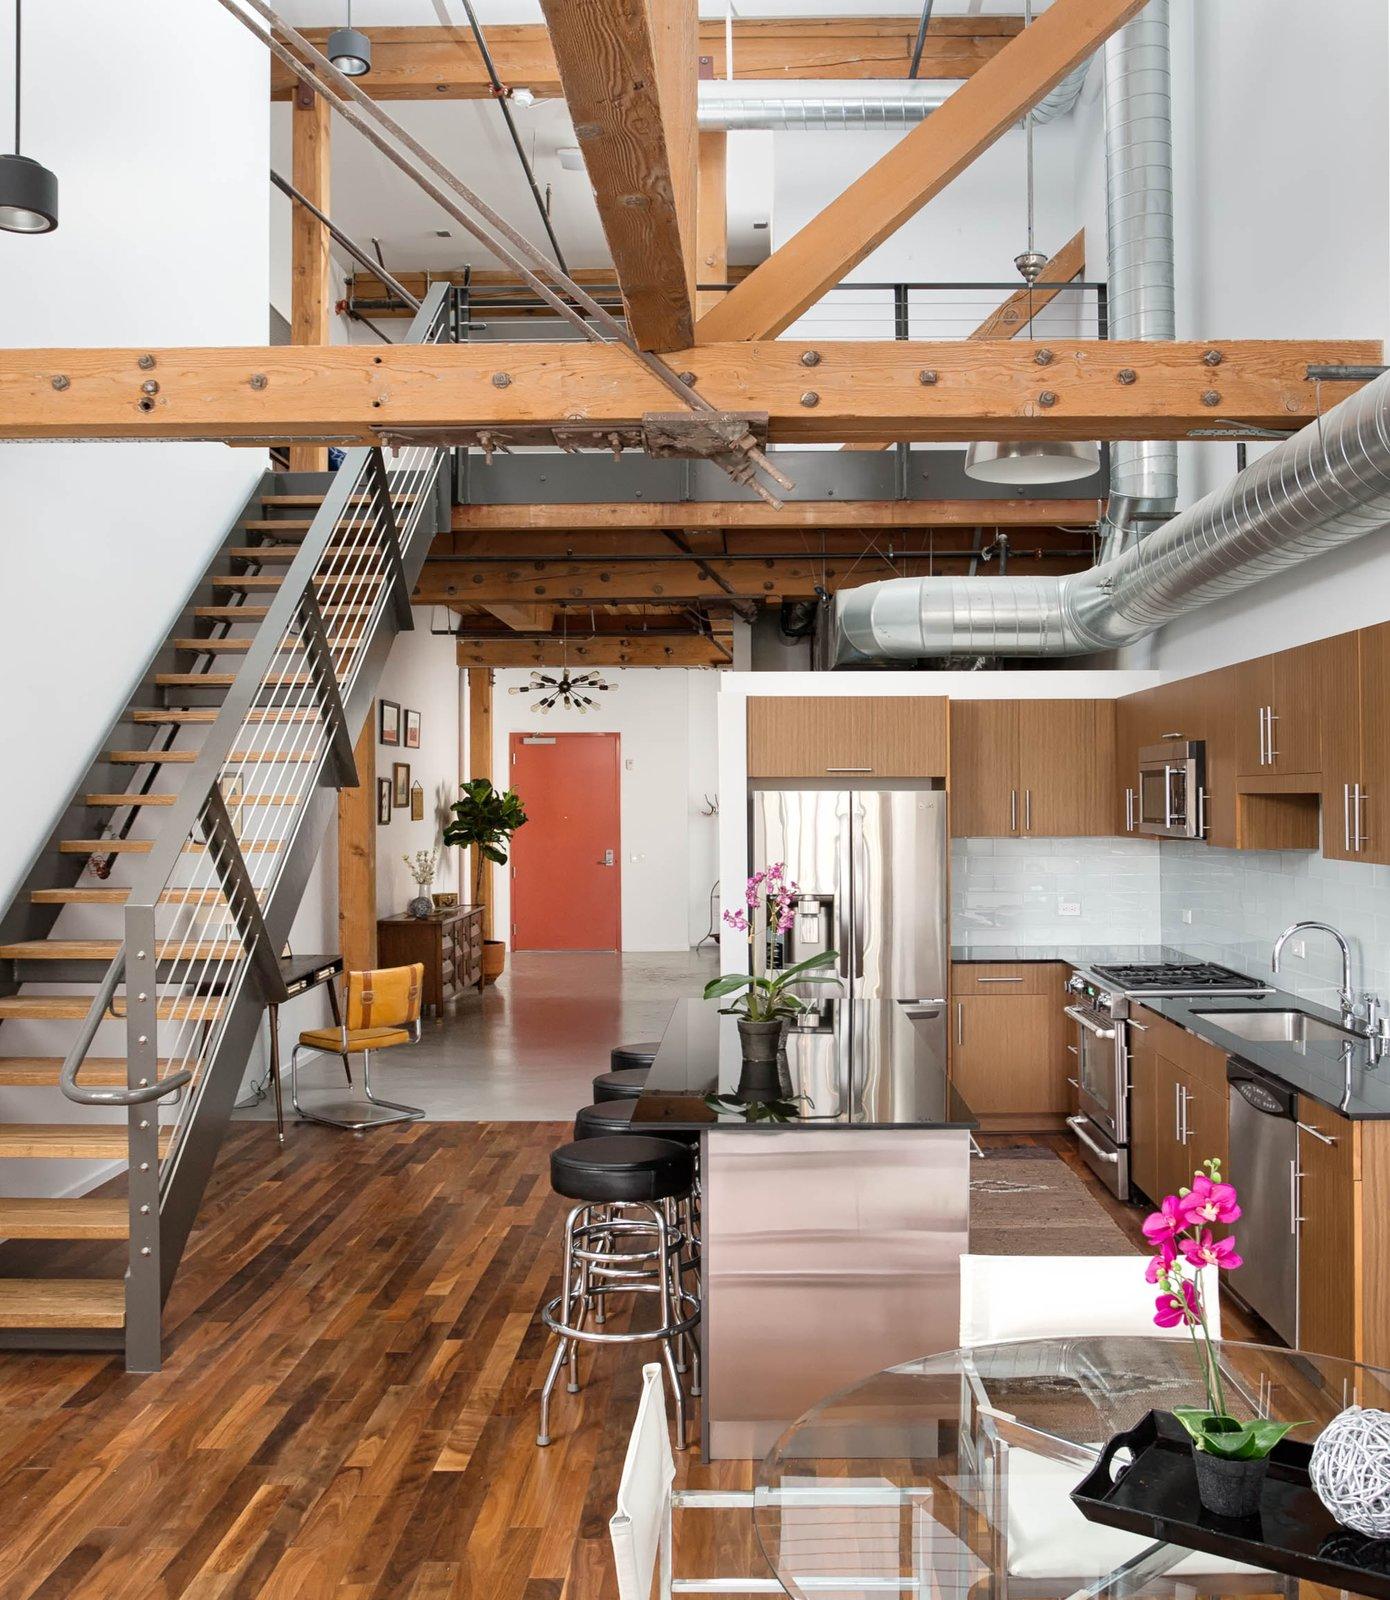 Kitchen, Granite Counter, Wood Cabinet, Ceiling Lighting, Pendant Lighting, Drop In Sink, Medium Hardwood Floor, and Subway Tile Backsplashe  Best Photos from Modern Downtown LA Loft